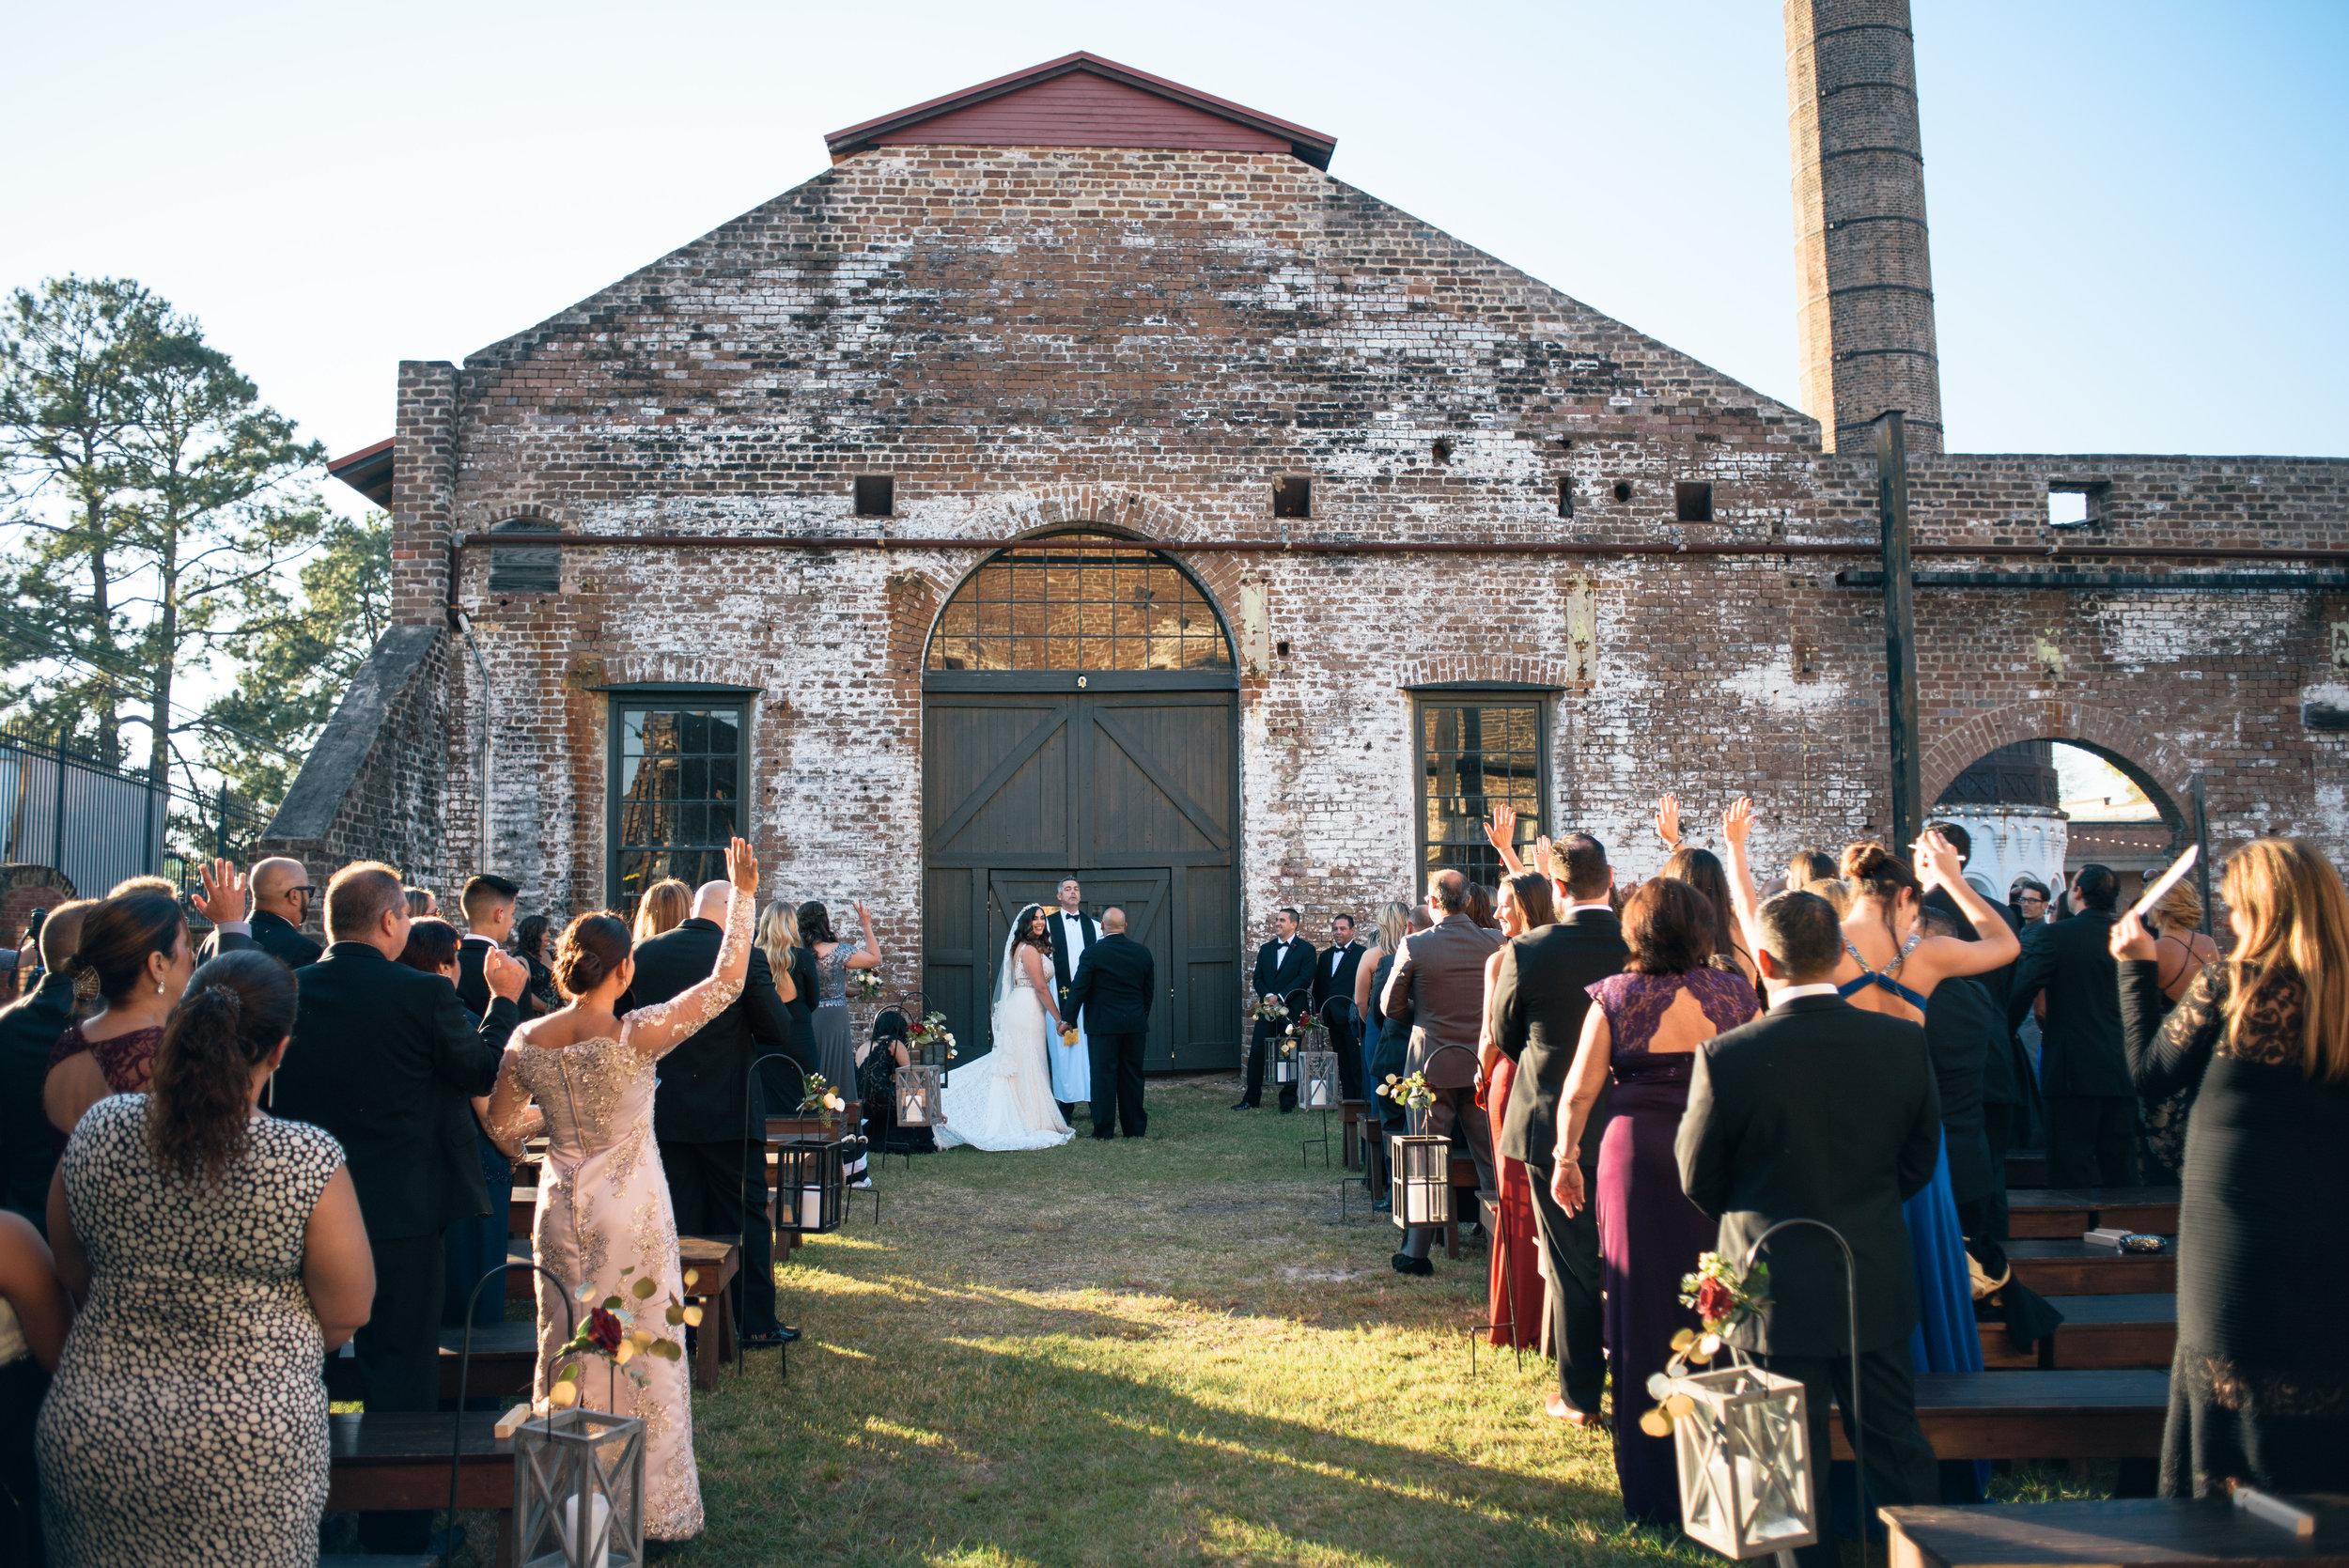 Iggy-and-yesenia-savannah-railroad-museum-wedding-meg-hill-photo- (467 of 1037).jpg